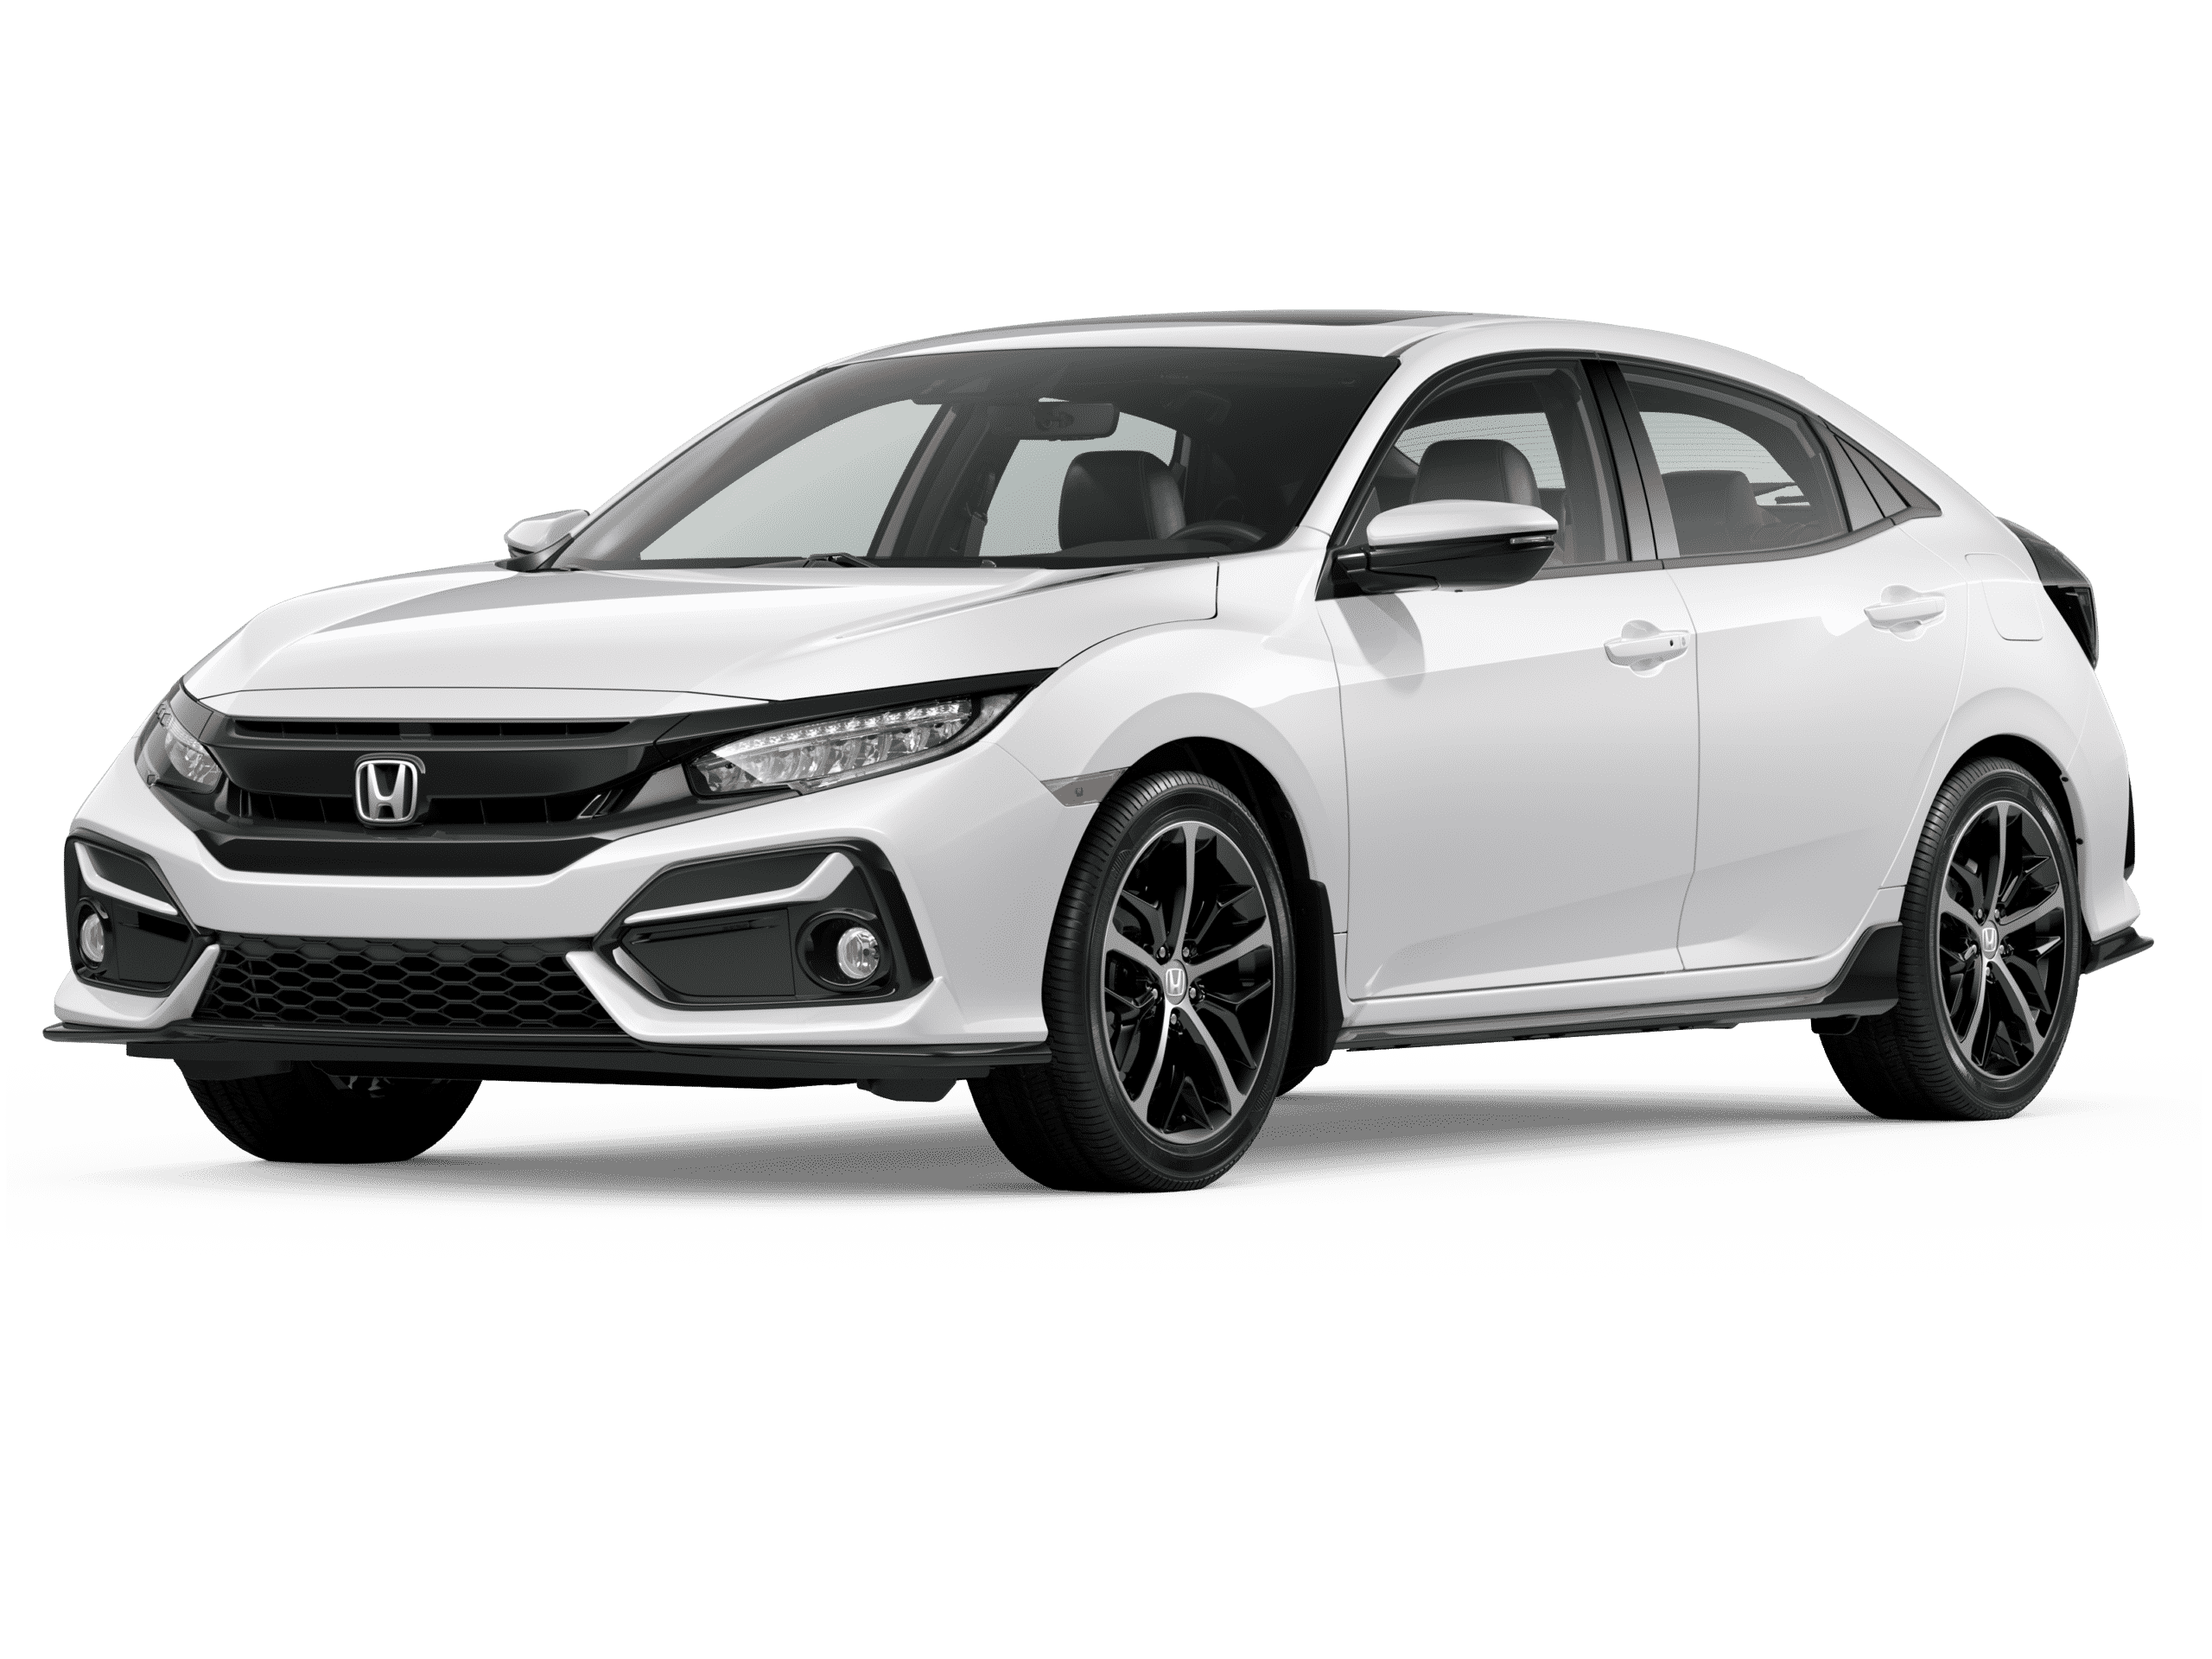 2020 Honda Civic Dealer Cost Report